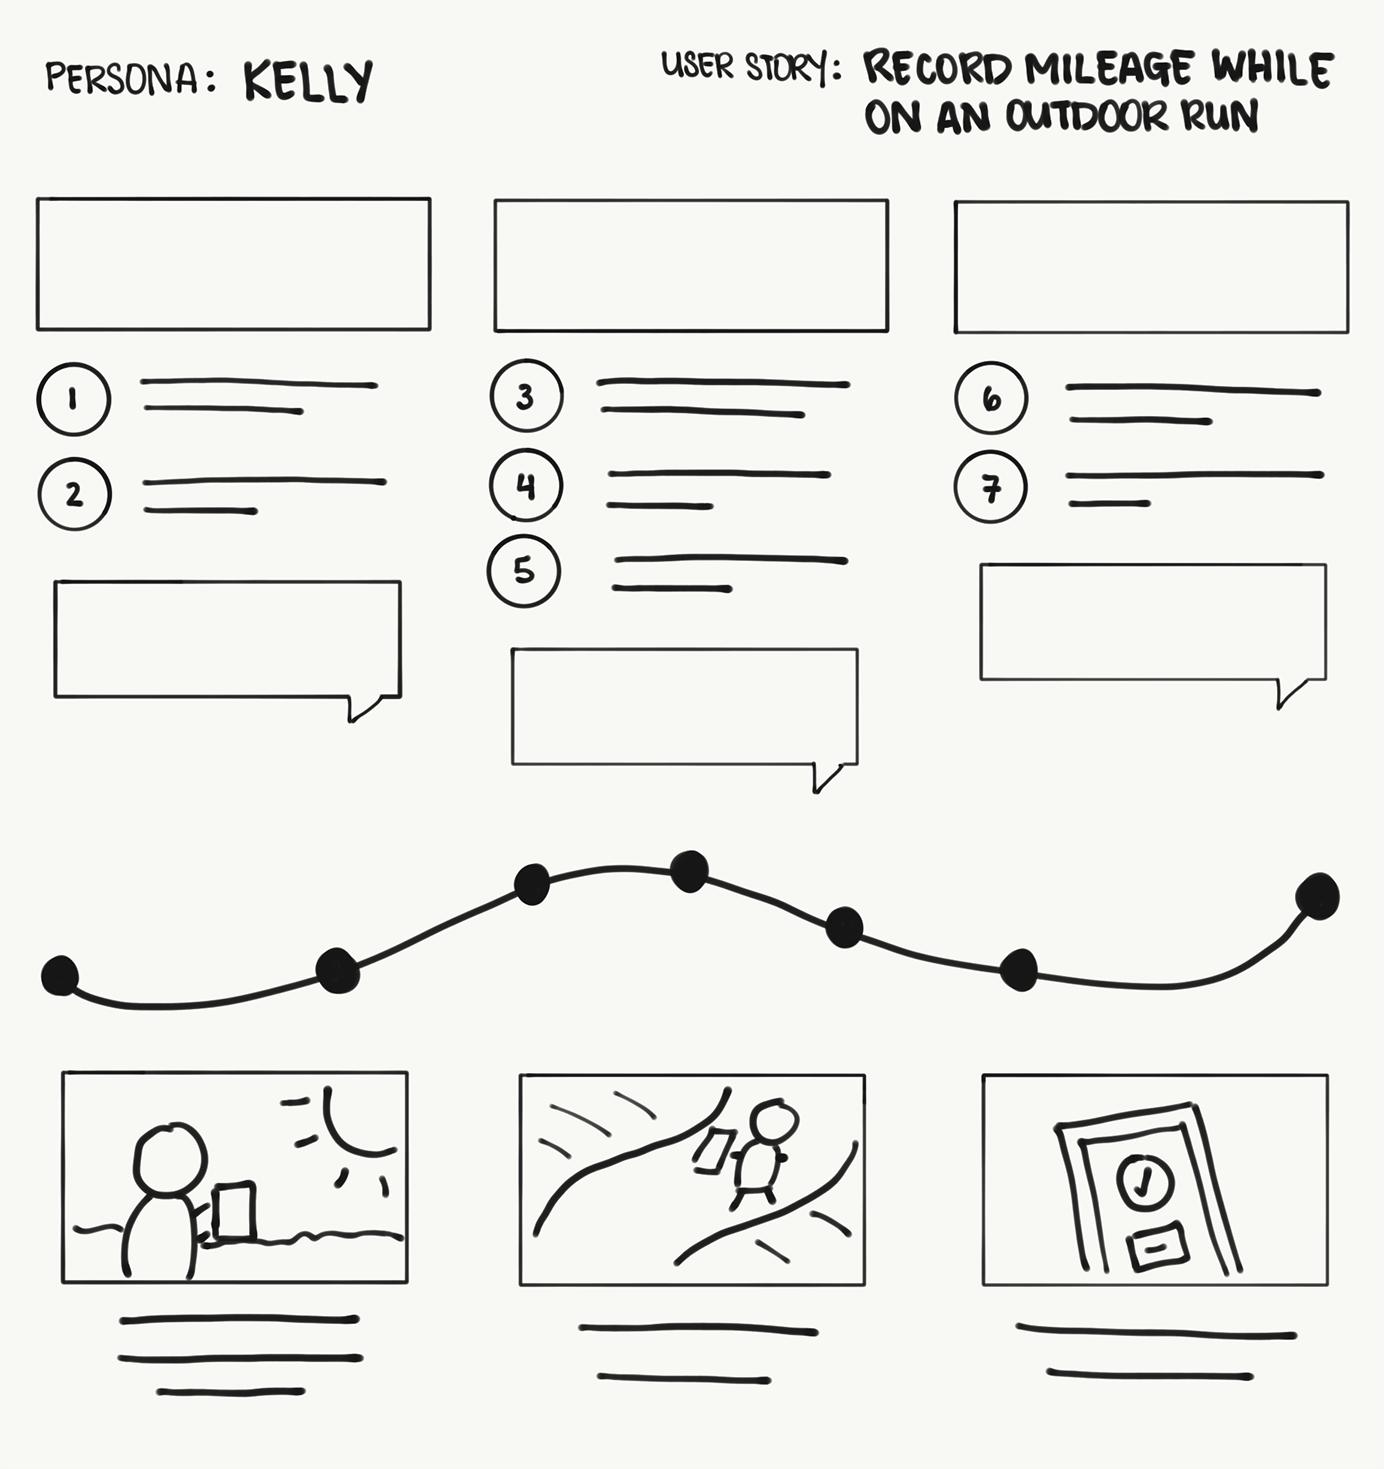 Journey Map Storyboard Ux Storyboard Basics Template Yourcustomersshoes Storyboard Design Storyboard Visual